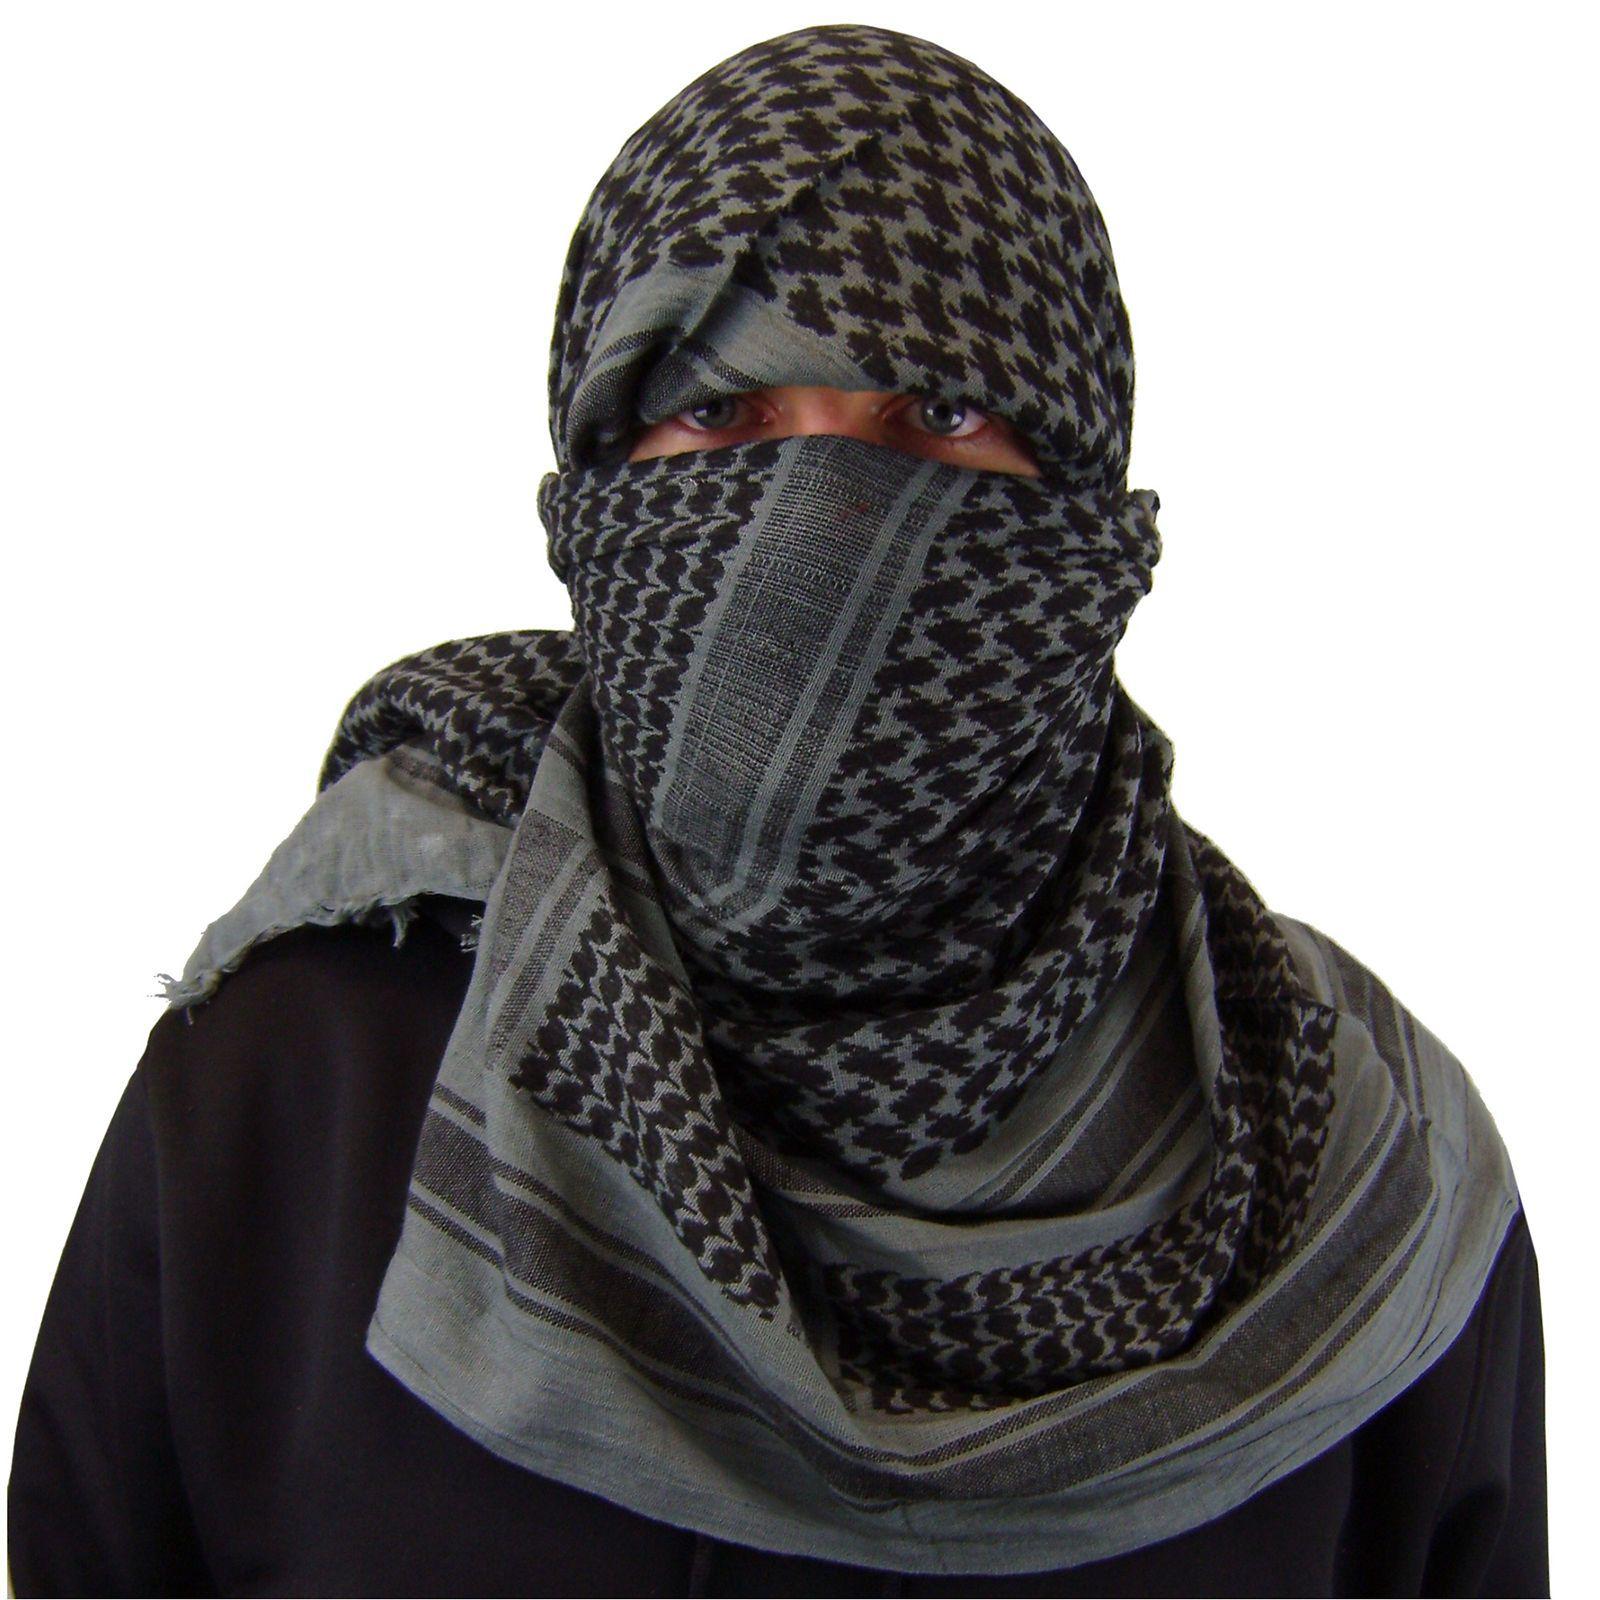 Shemagh Head Scarf Military Army Head Cover Tassels Arab Kafiya Keffiyah Web-tex